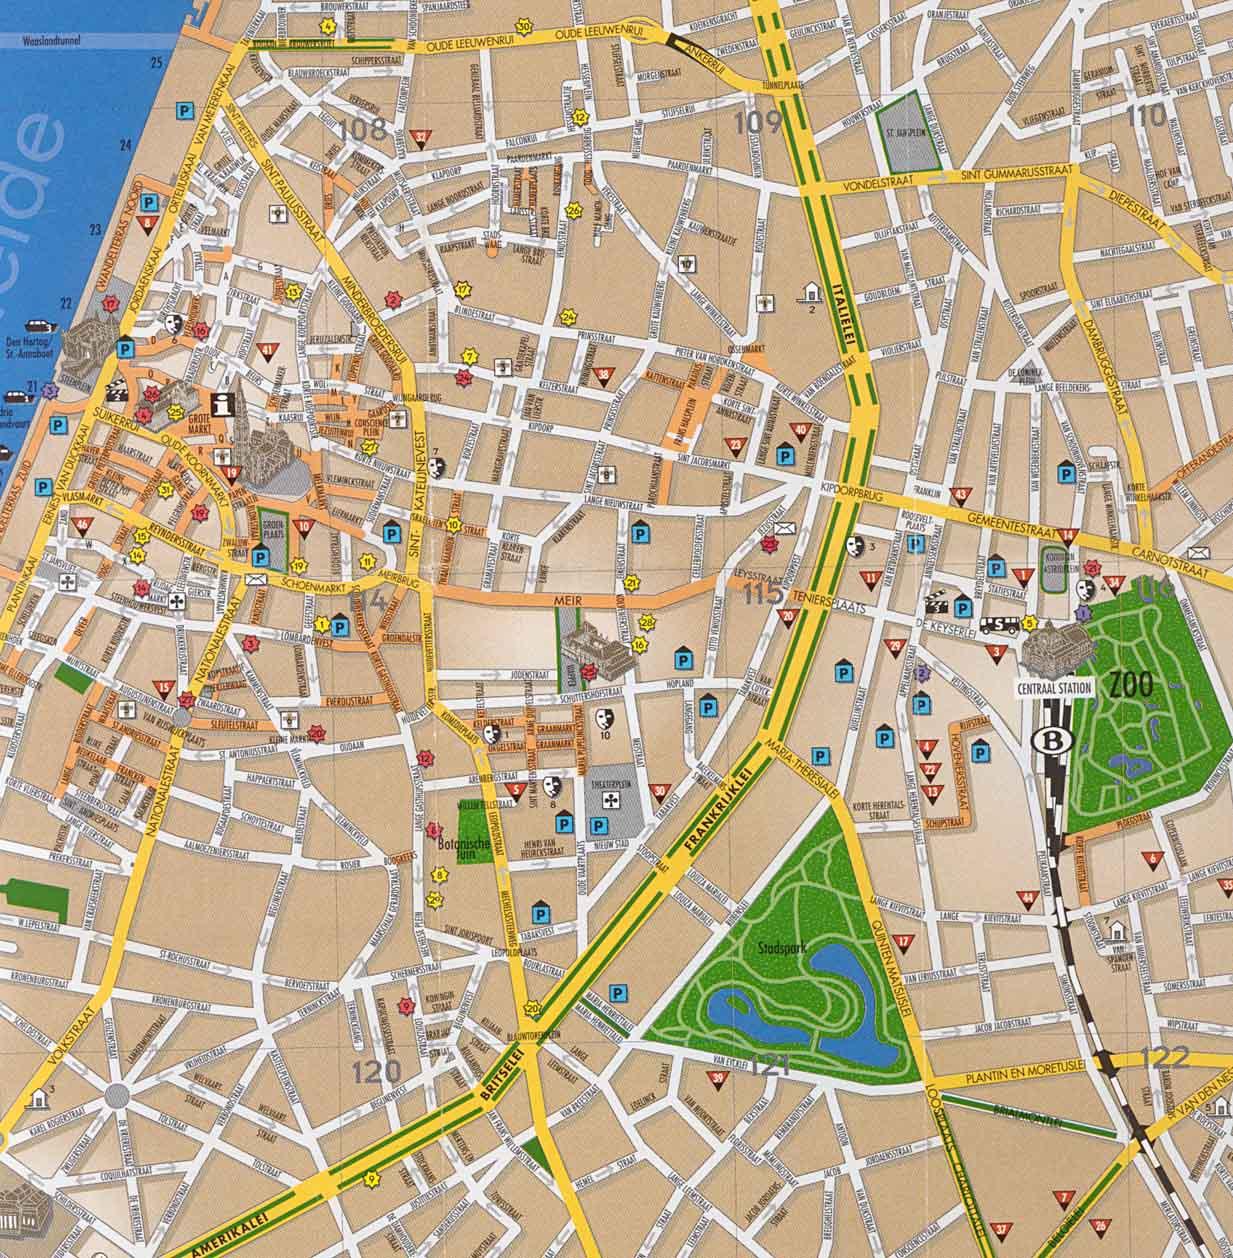 Antwerp Tourist Map Antwerp Belgium mappery